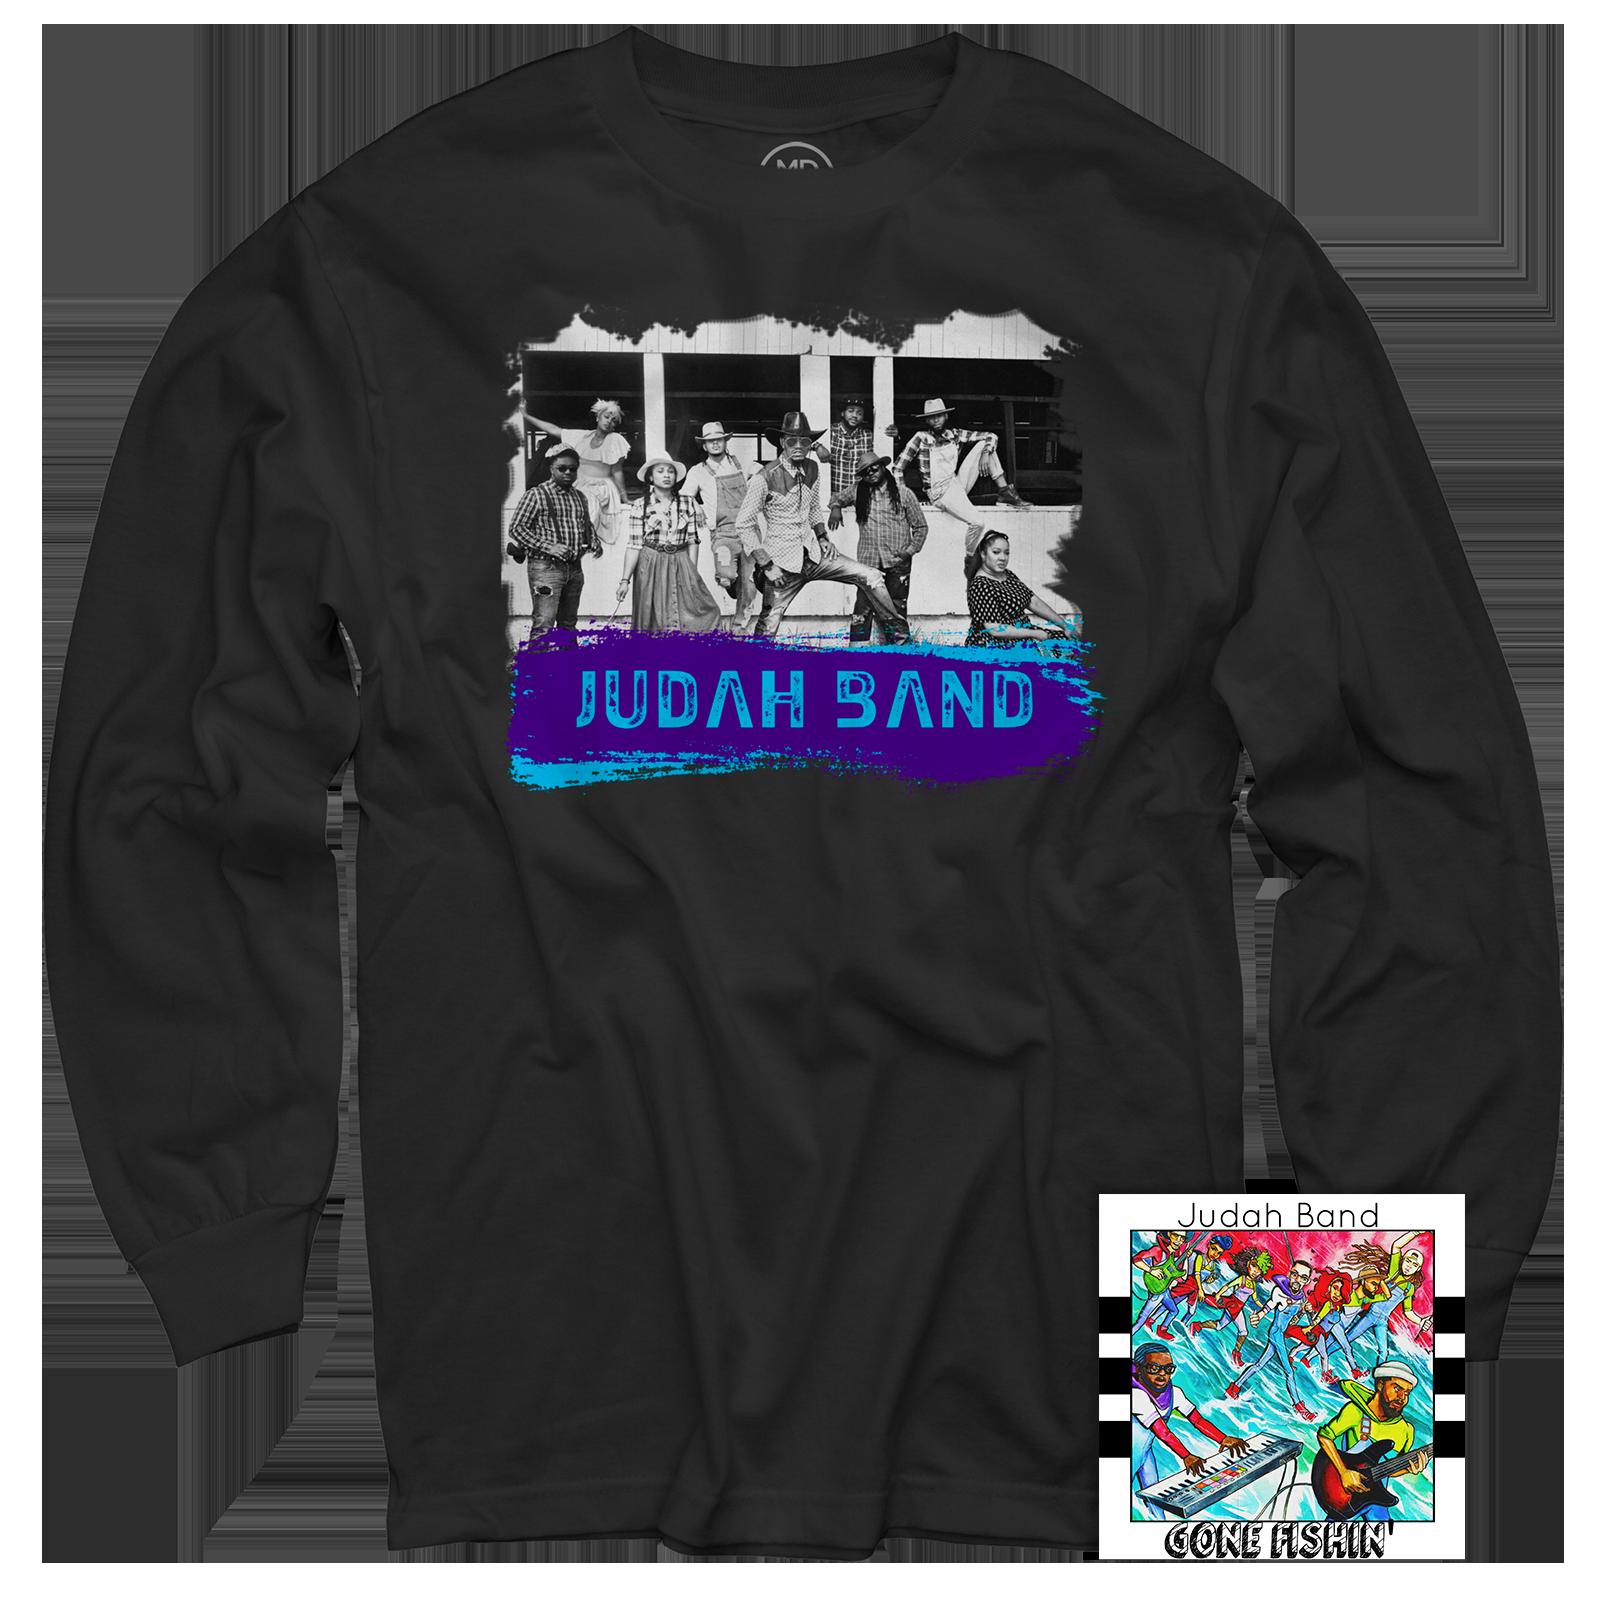 Judah Band Black Long Sleeve + Gone Fishin' CD